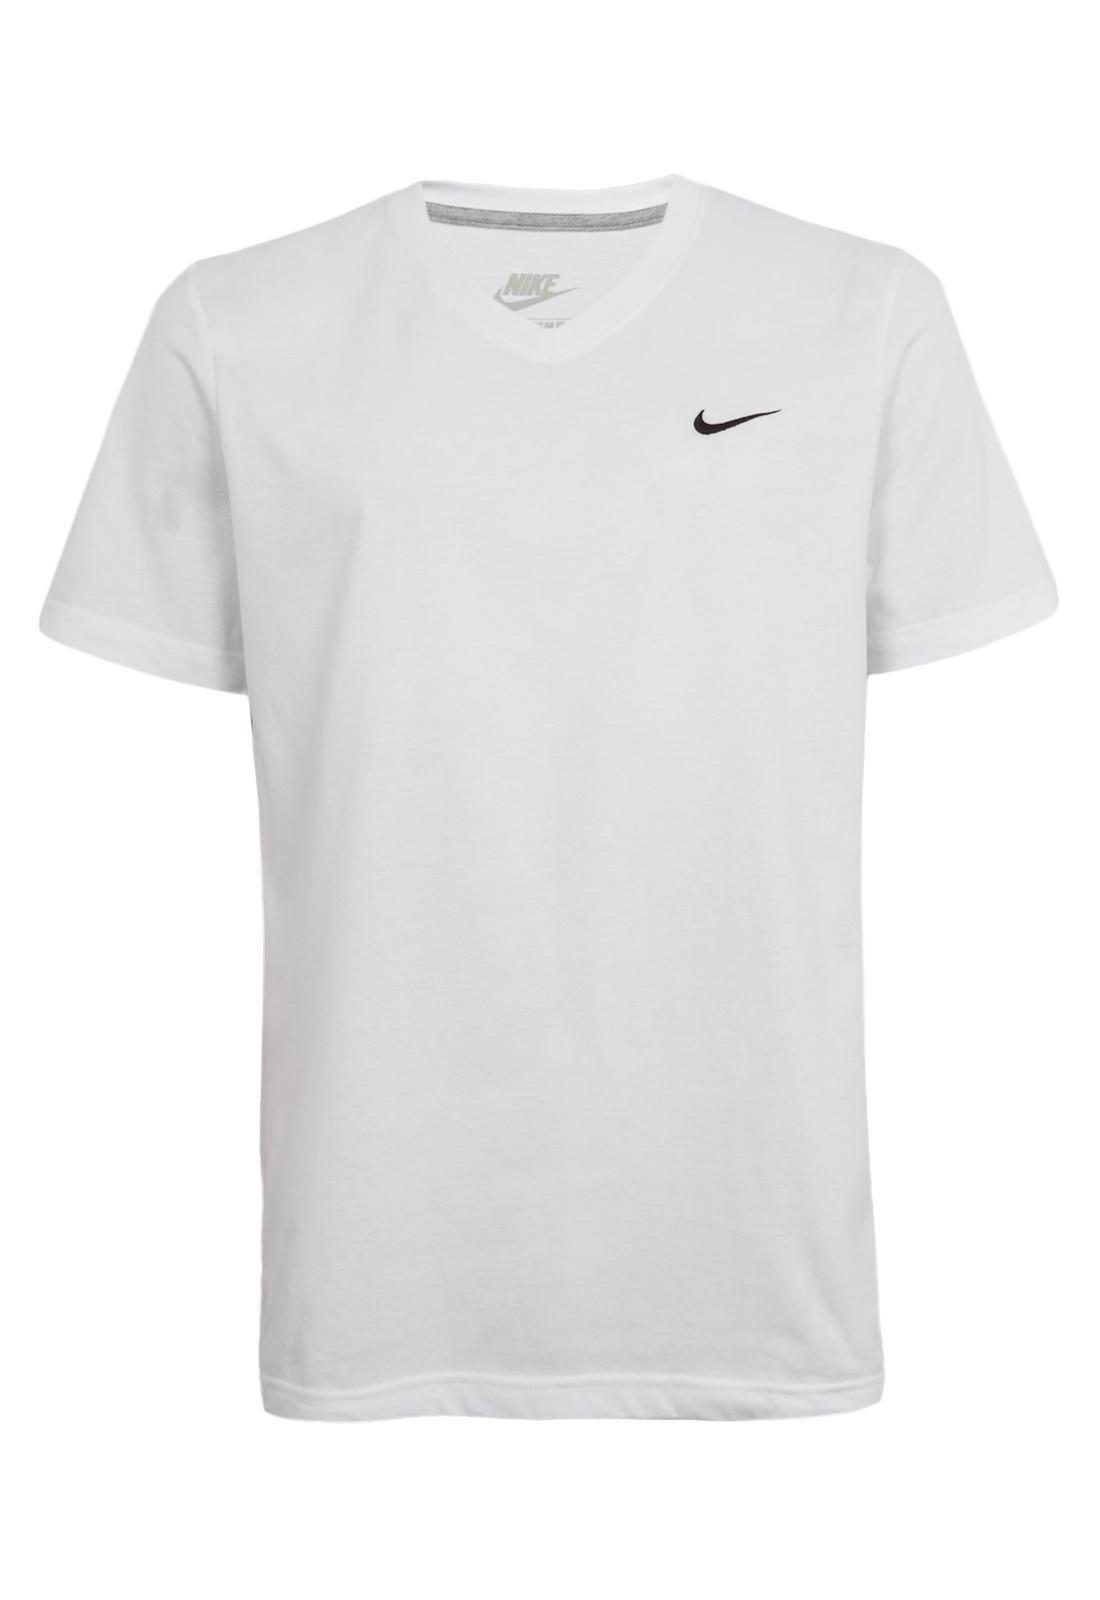 fragancia Remisión su  Camiseta Nike Sportswear Solid Futura Branca - Compre Agora | Dafiti Brasil